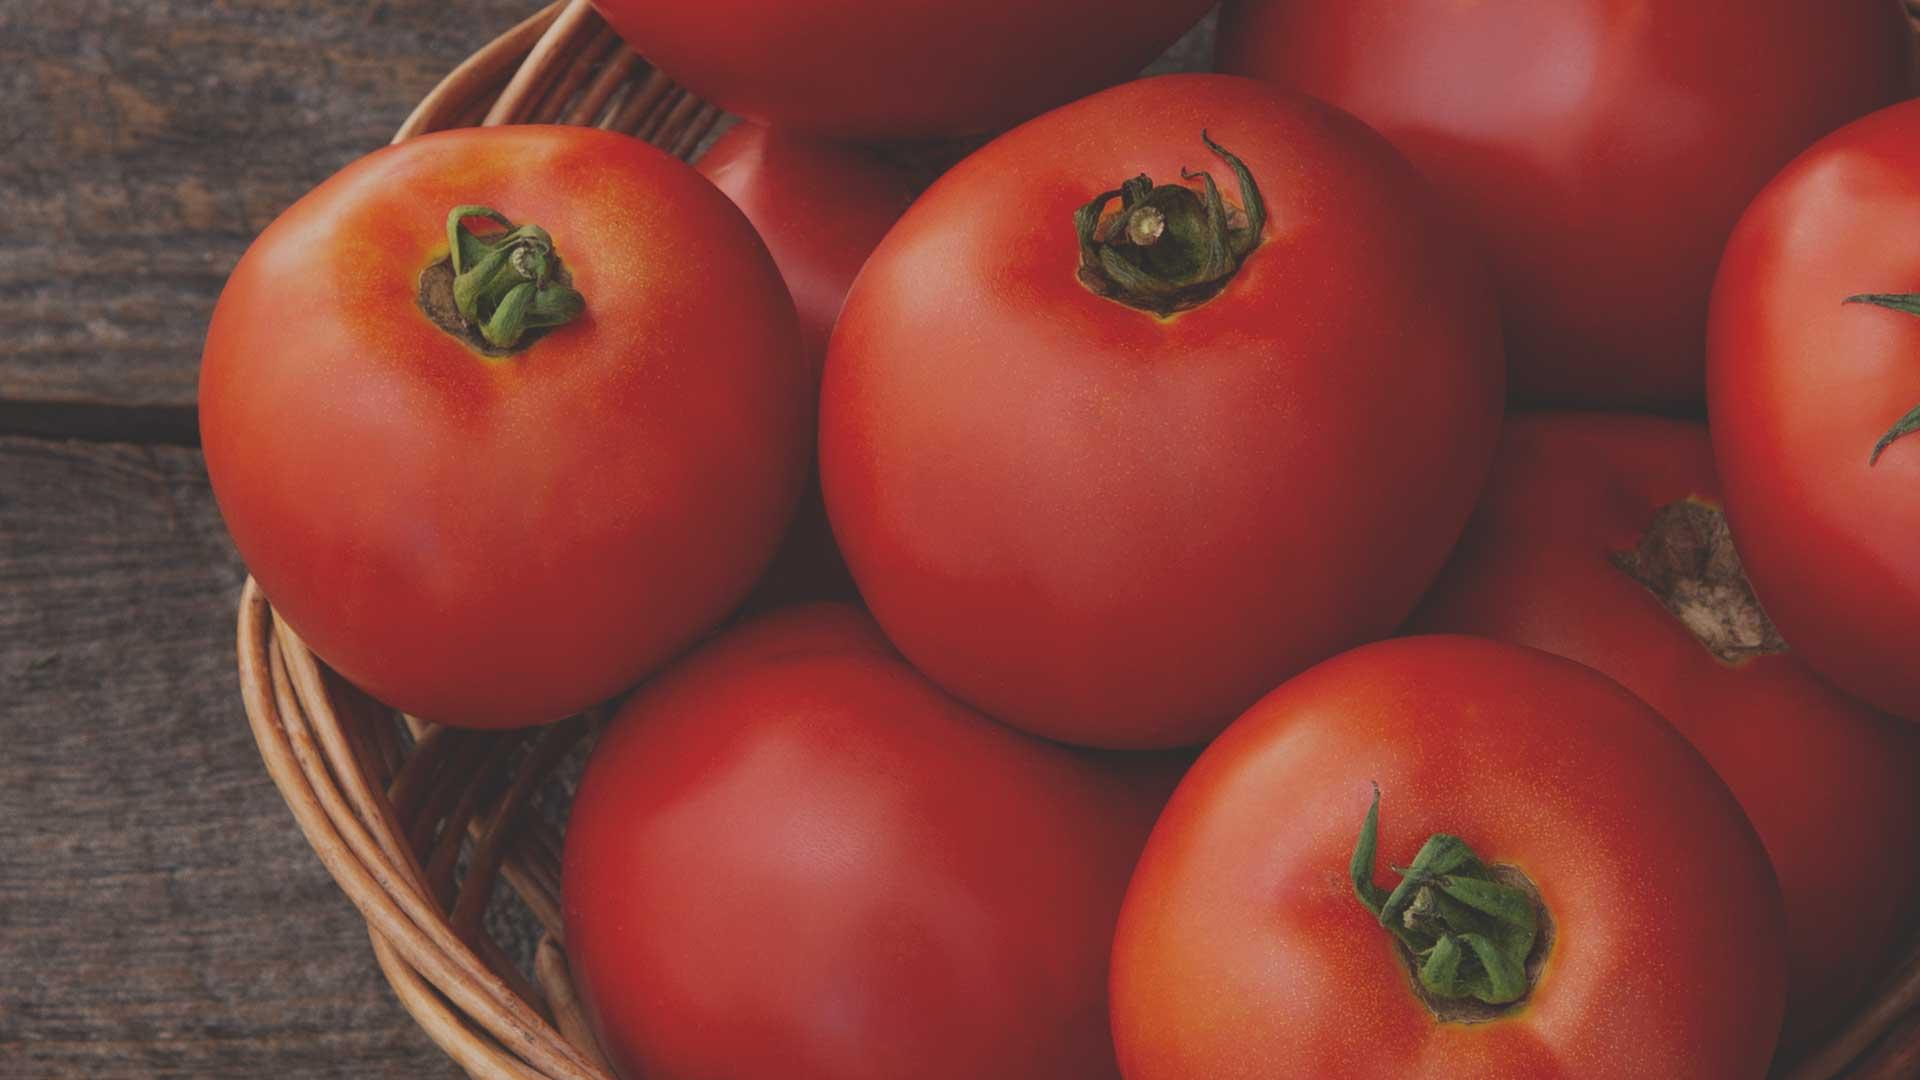 Organic Non-GMO Galahad F1 Tomato from High Mowing Organic Seeds